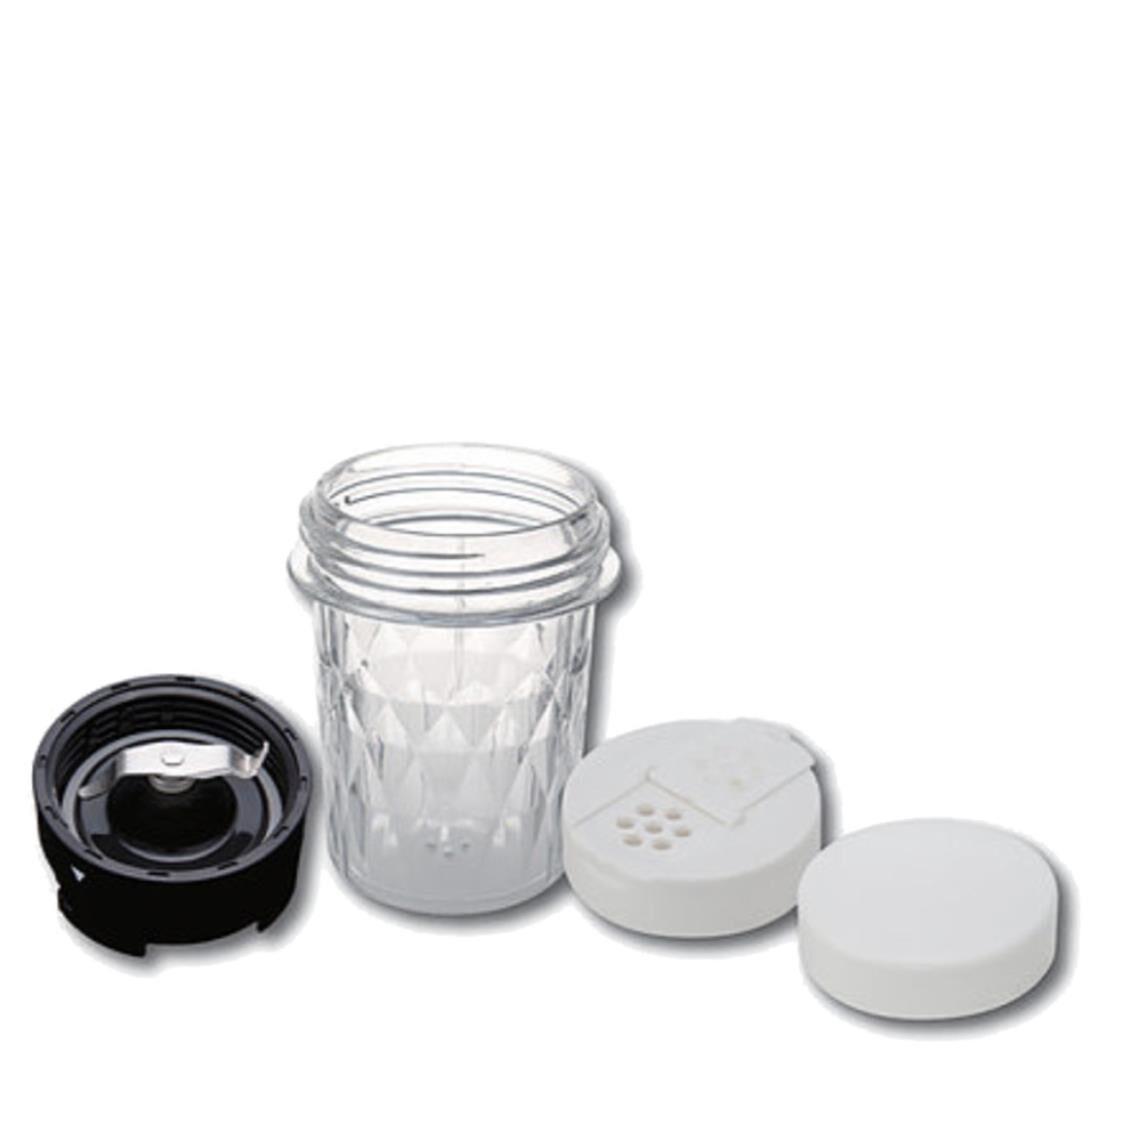 Vitantonio My Bottle Blender - Grinder Set